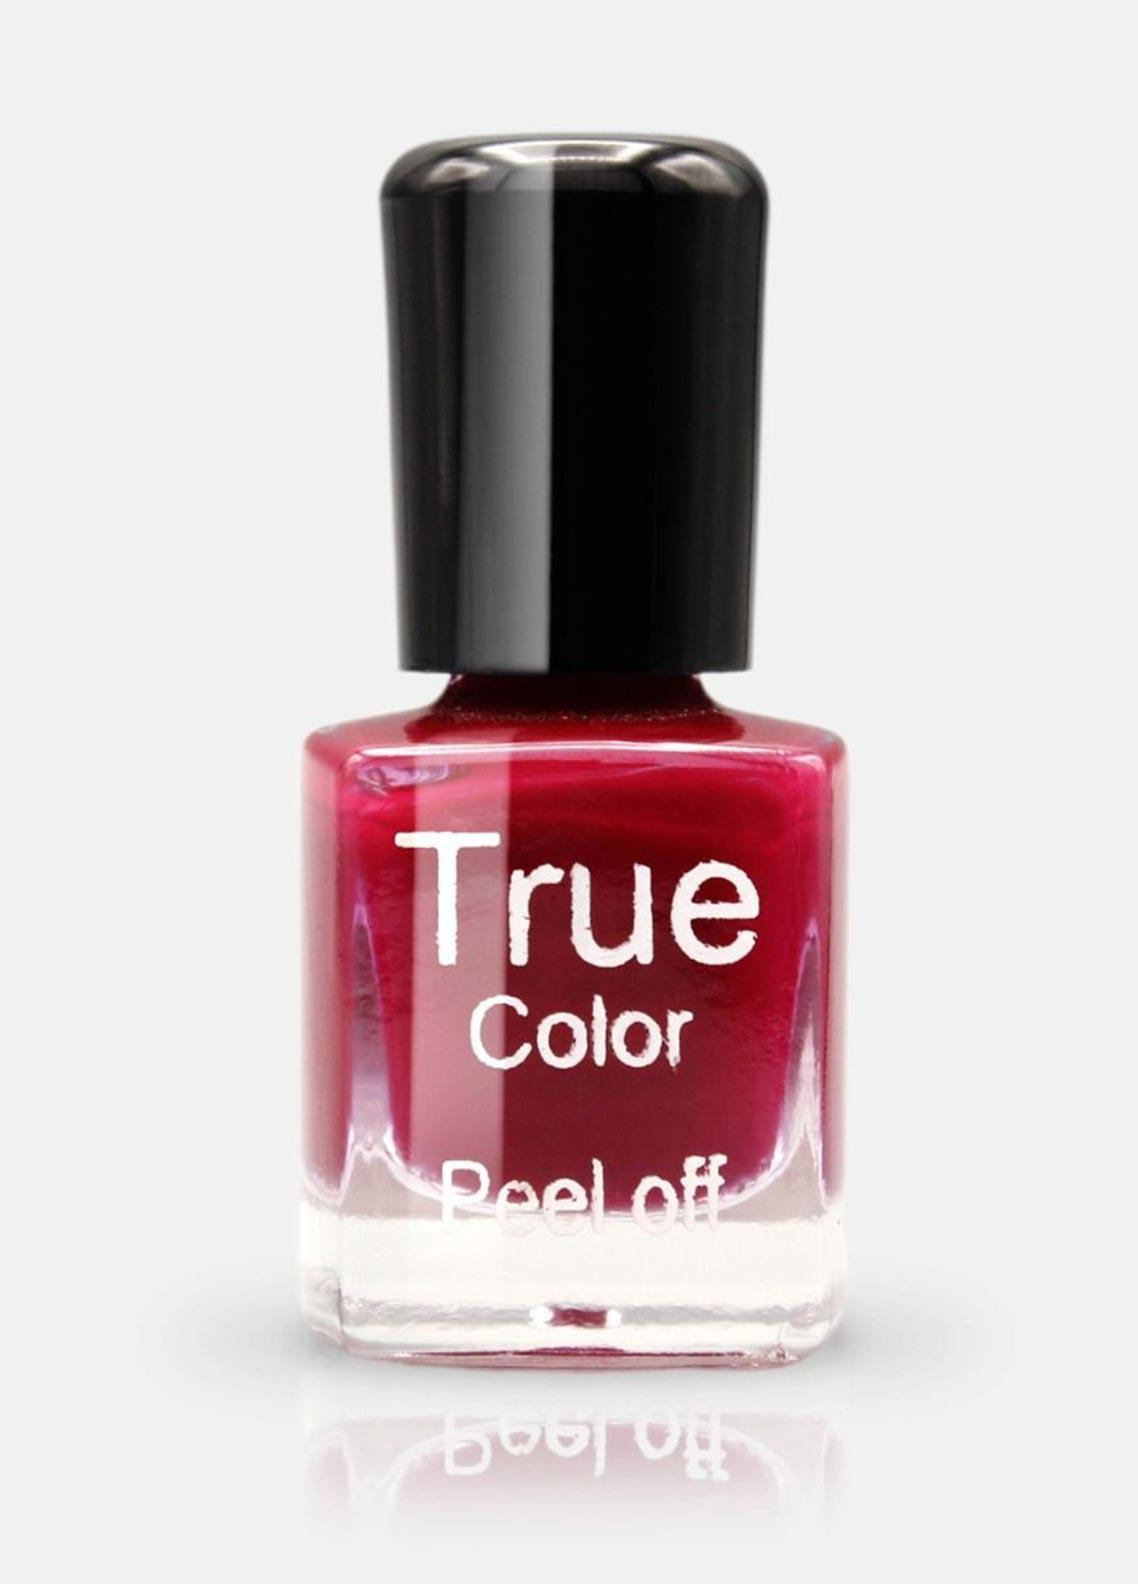 True Colors Peel Of Nail Mask-08